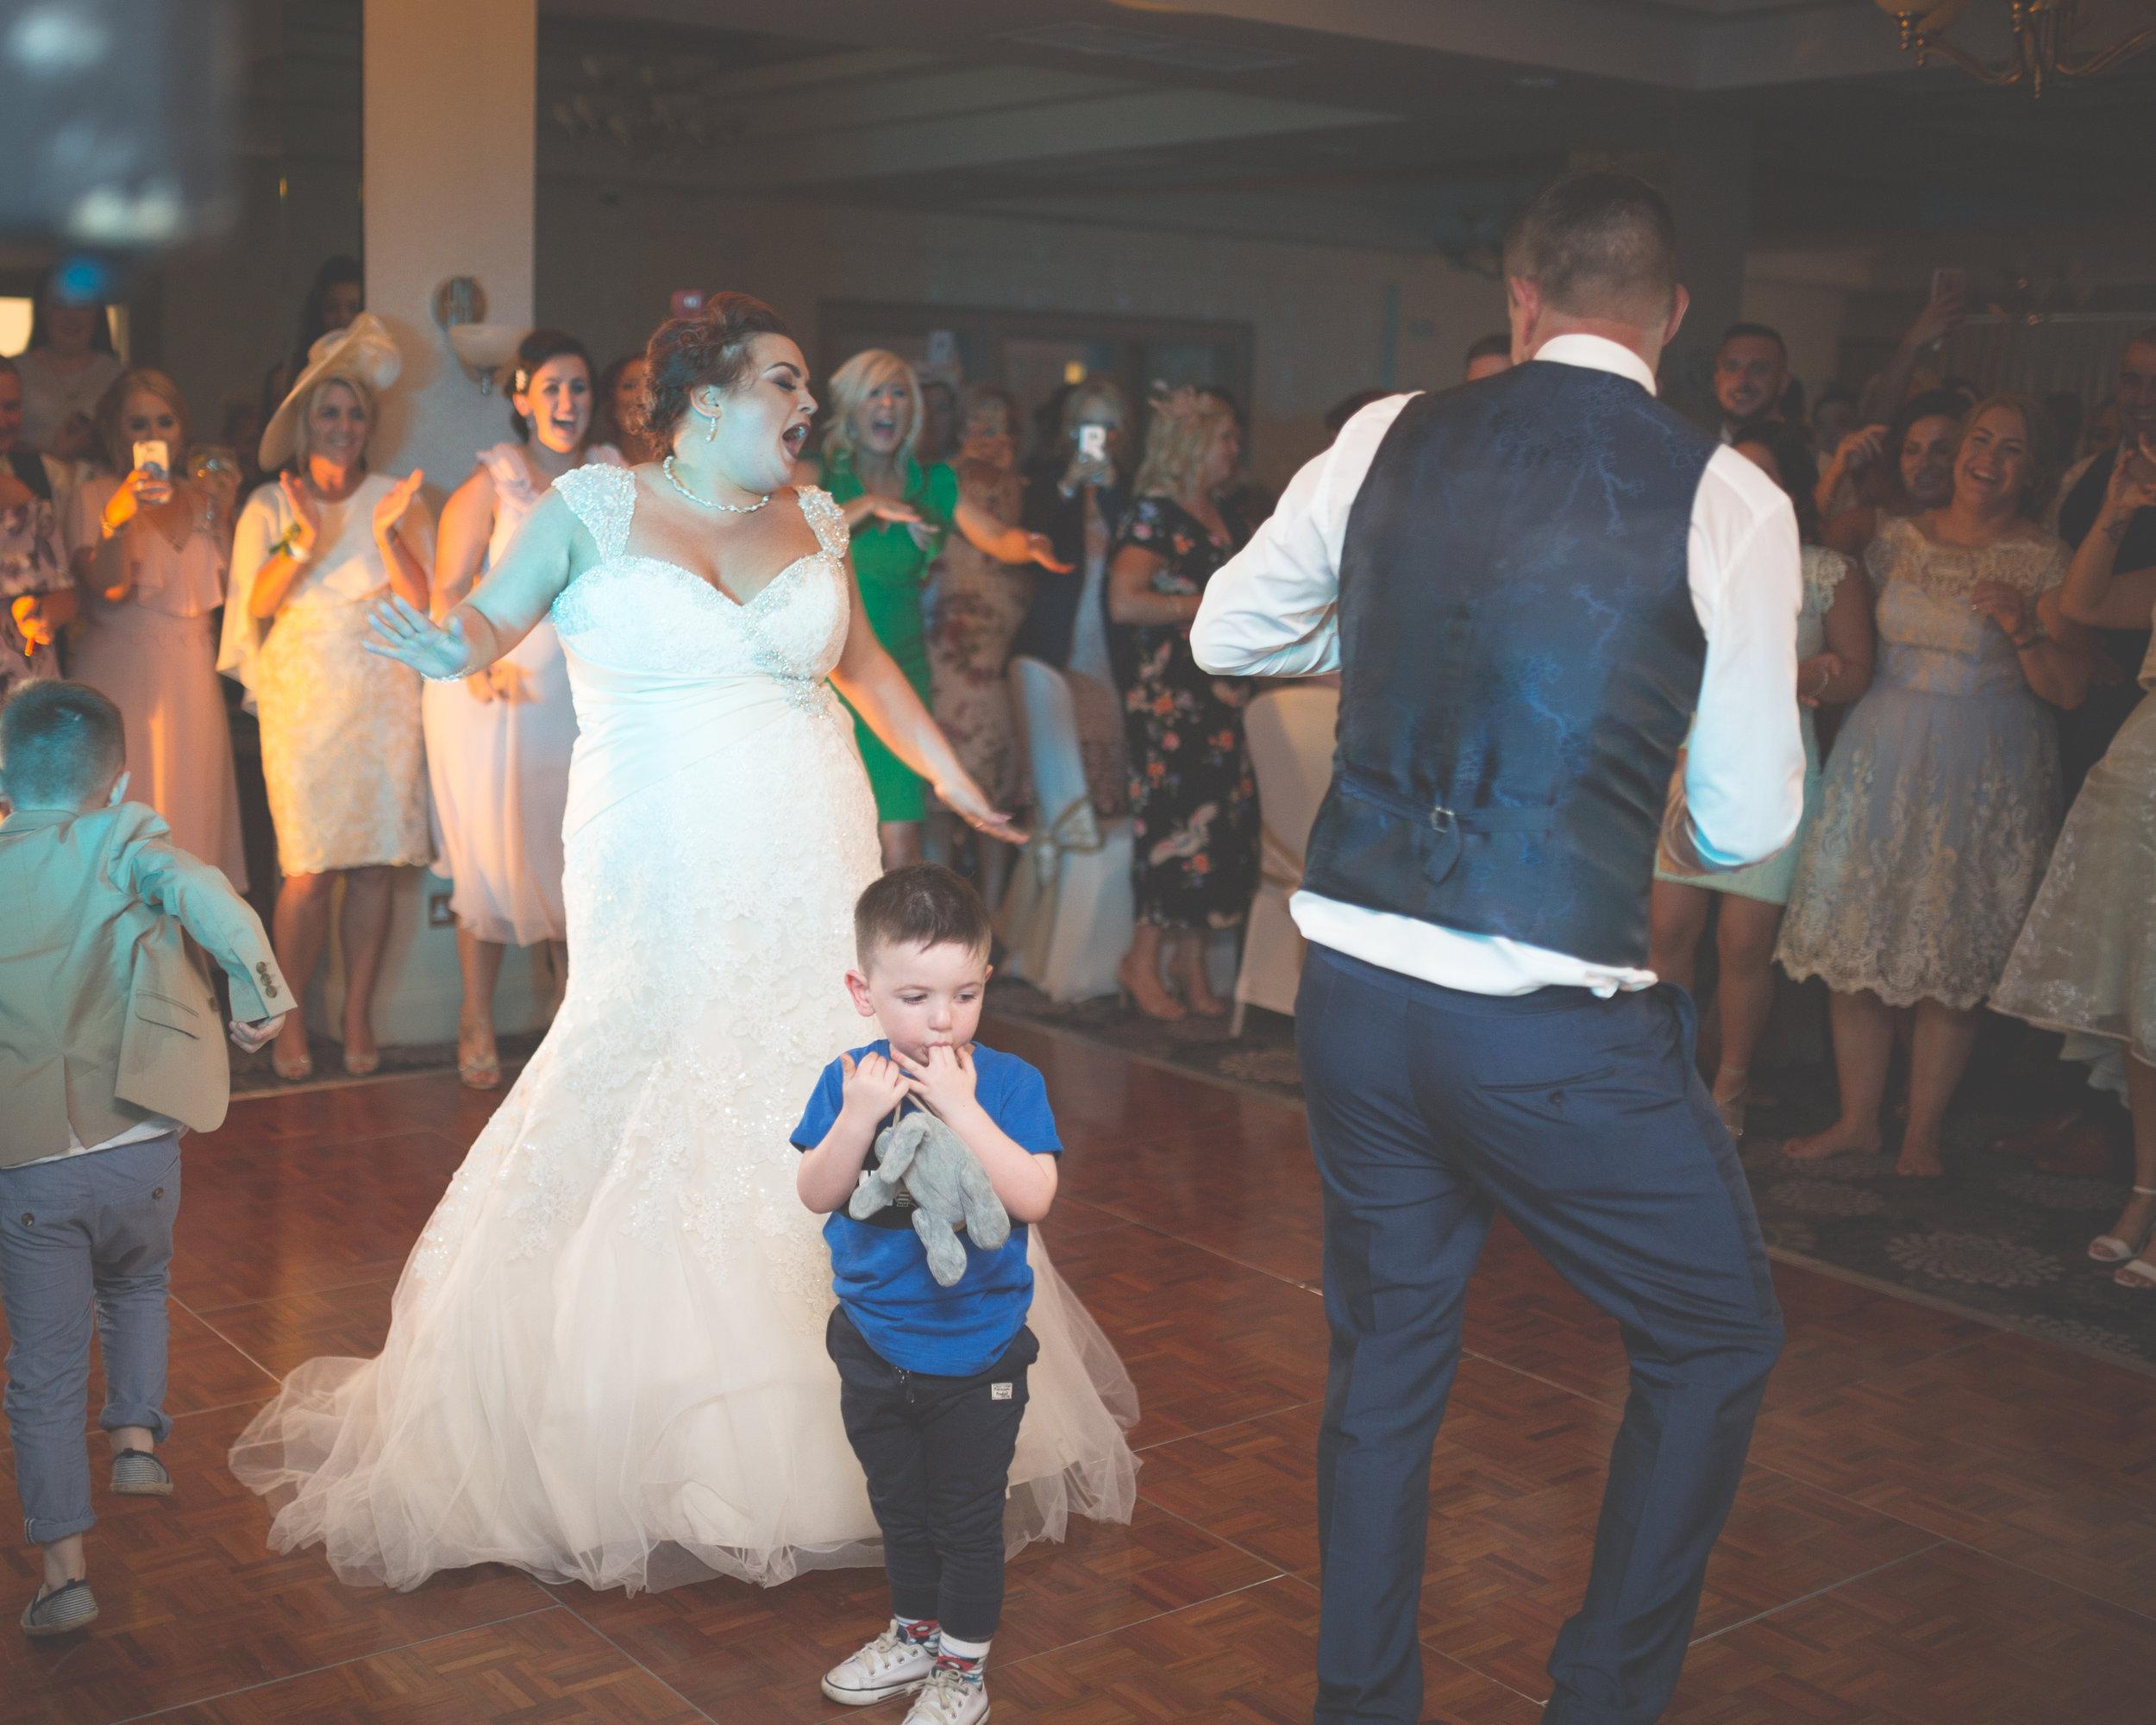 Antoinette & Stephen - First Dance | Brian McEwan Photography | Wedding Photographer Northern Ireland 25.jpg